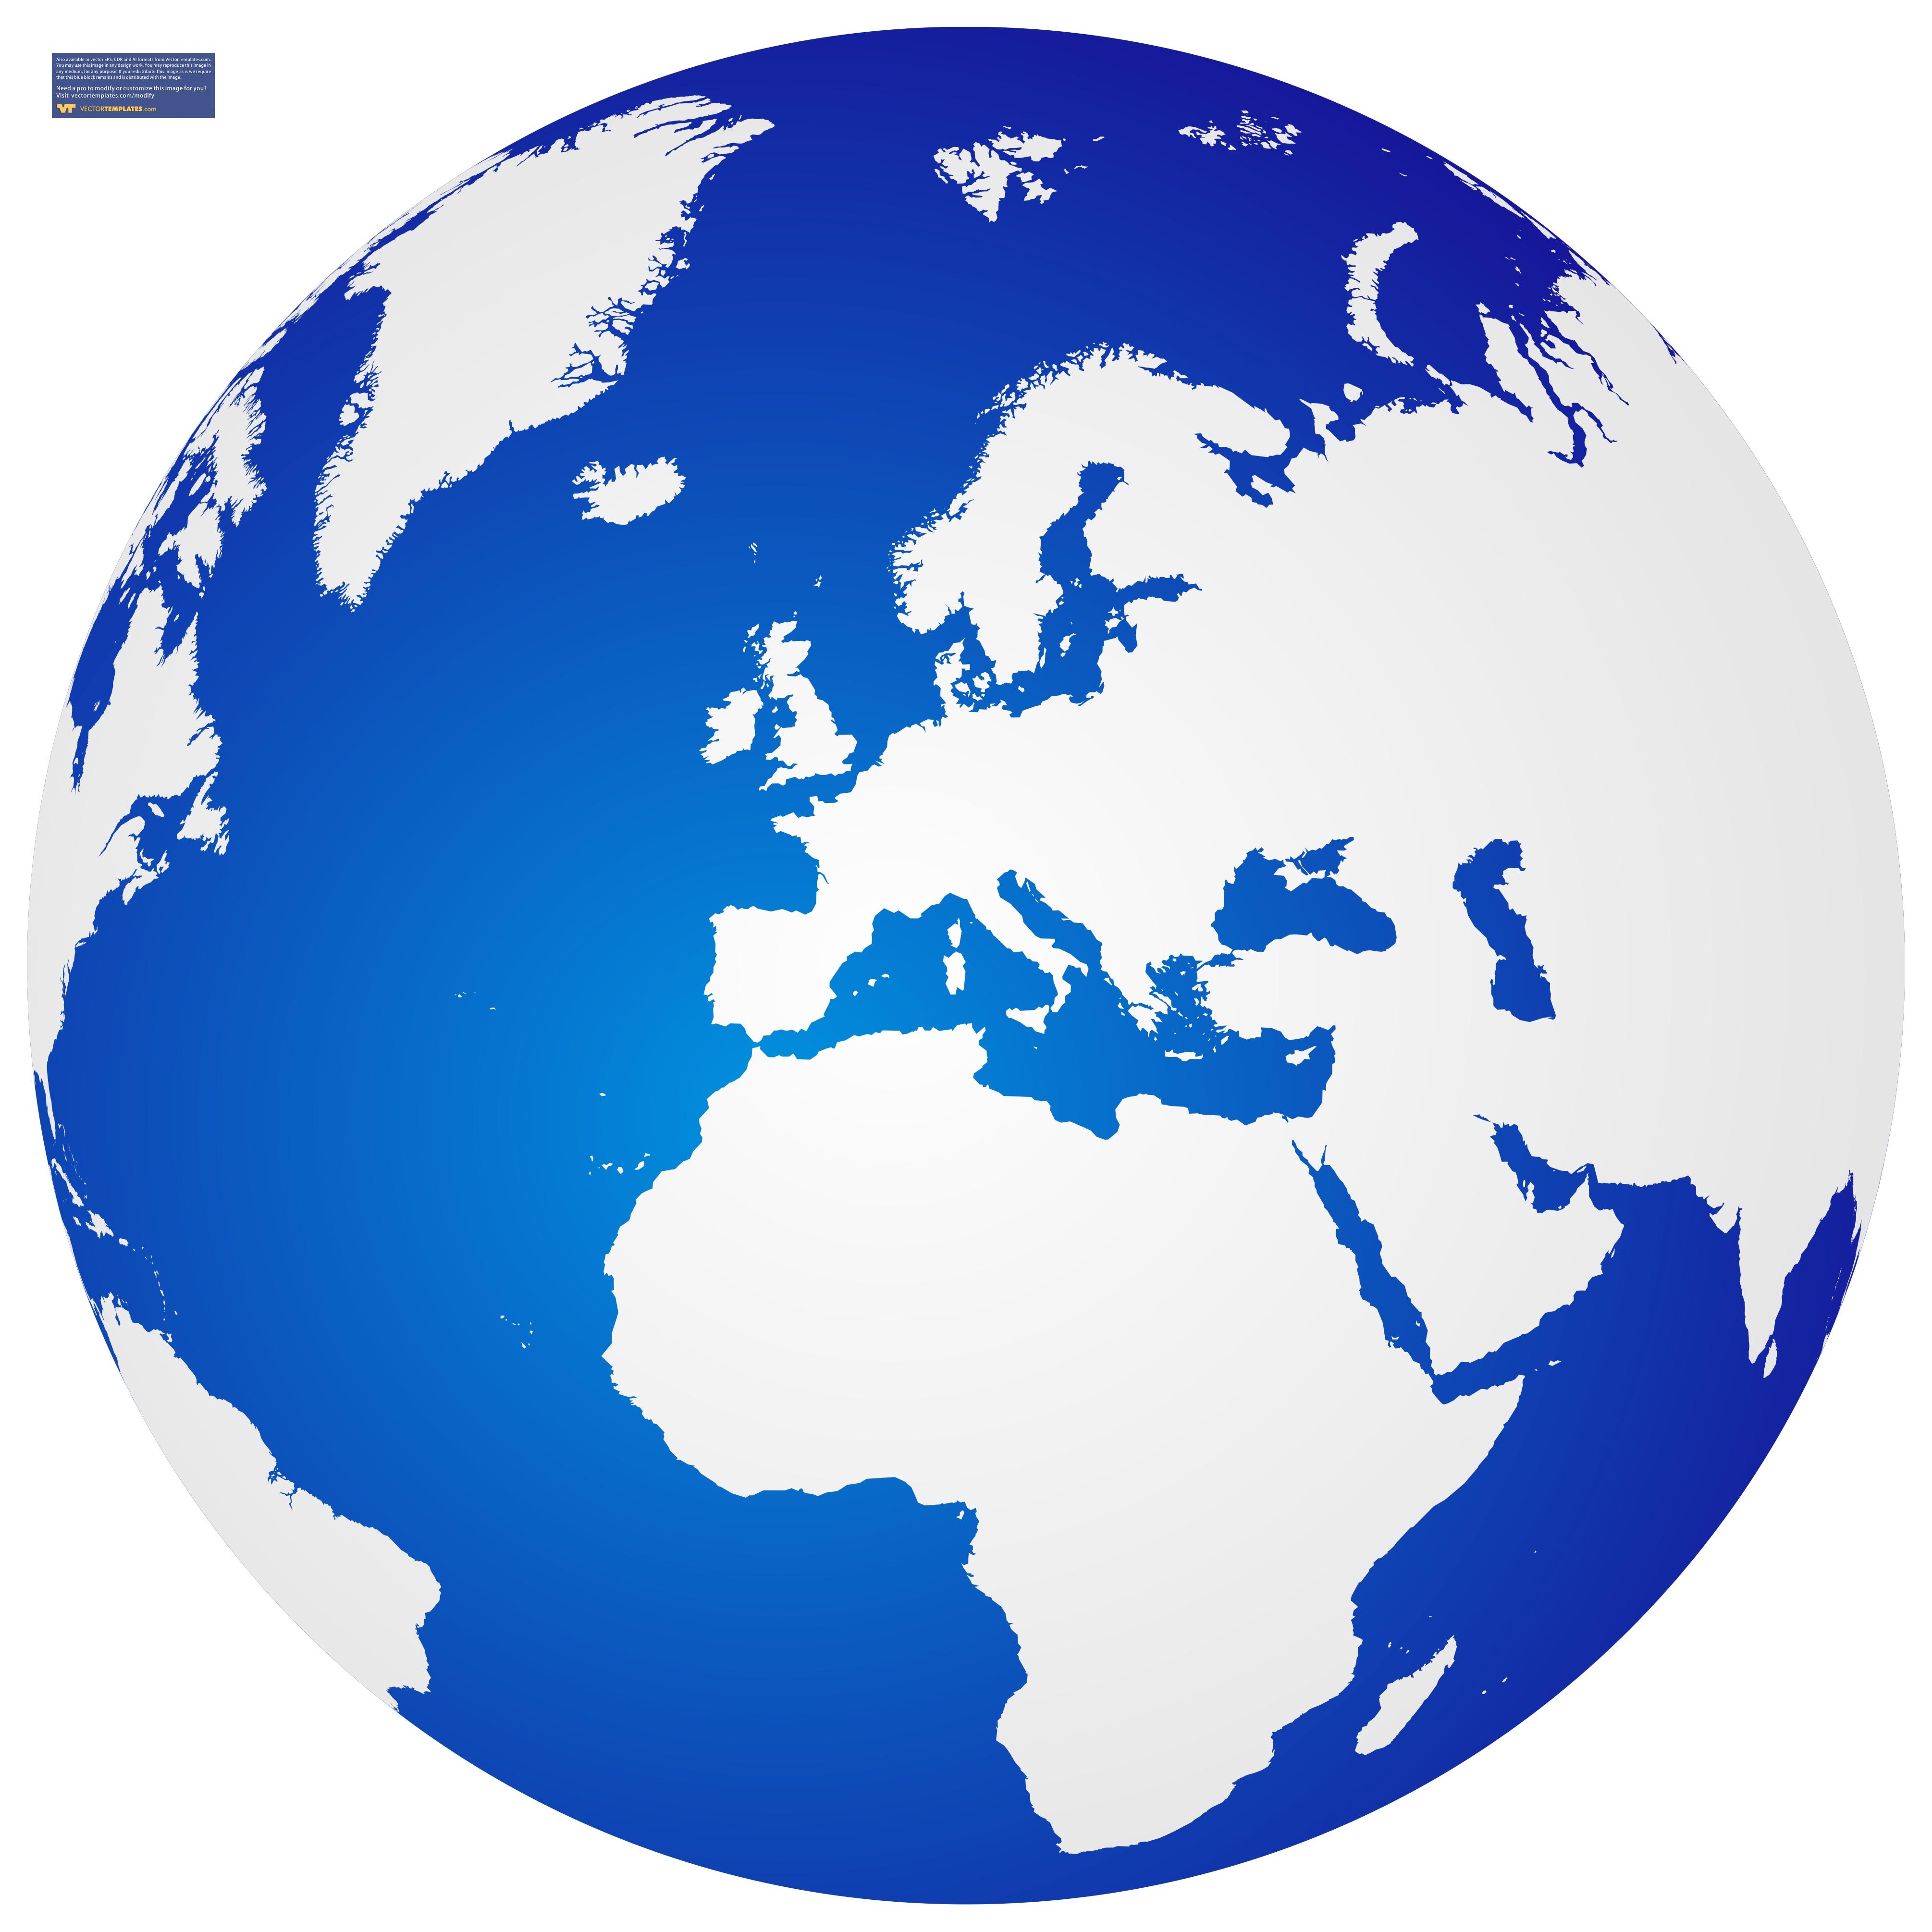 Globe Png image #39549